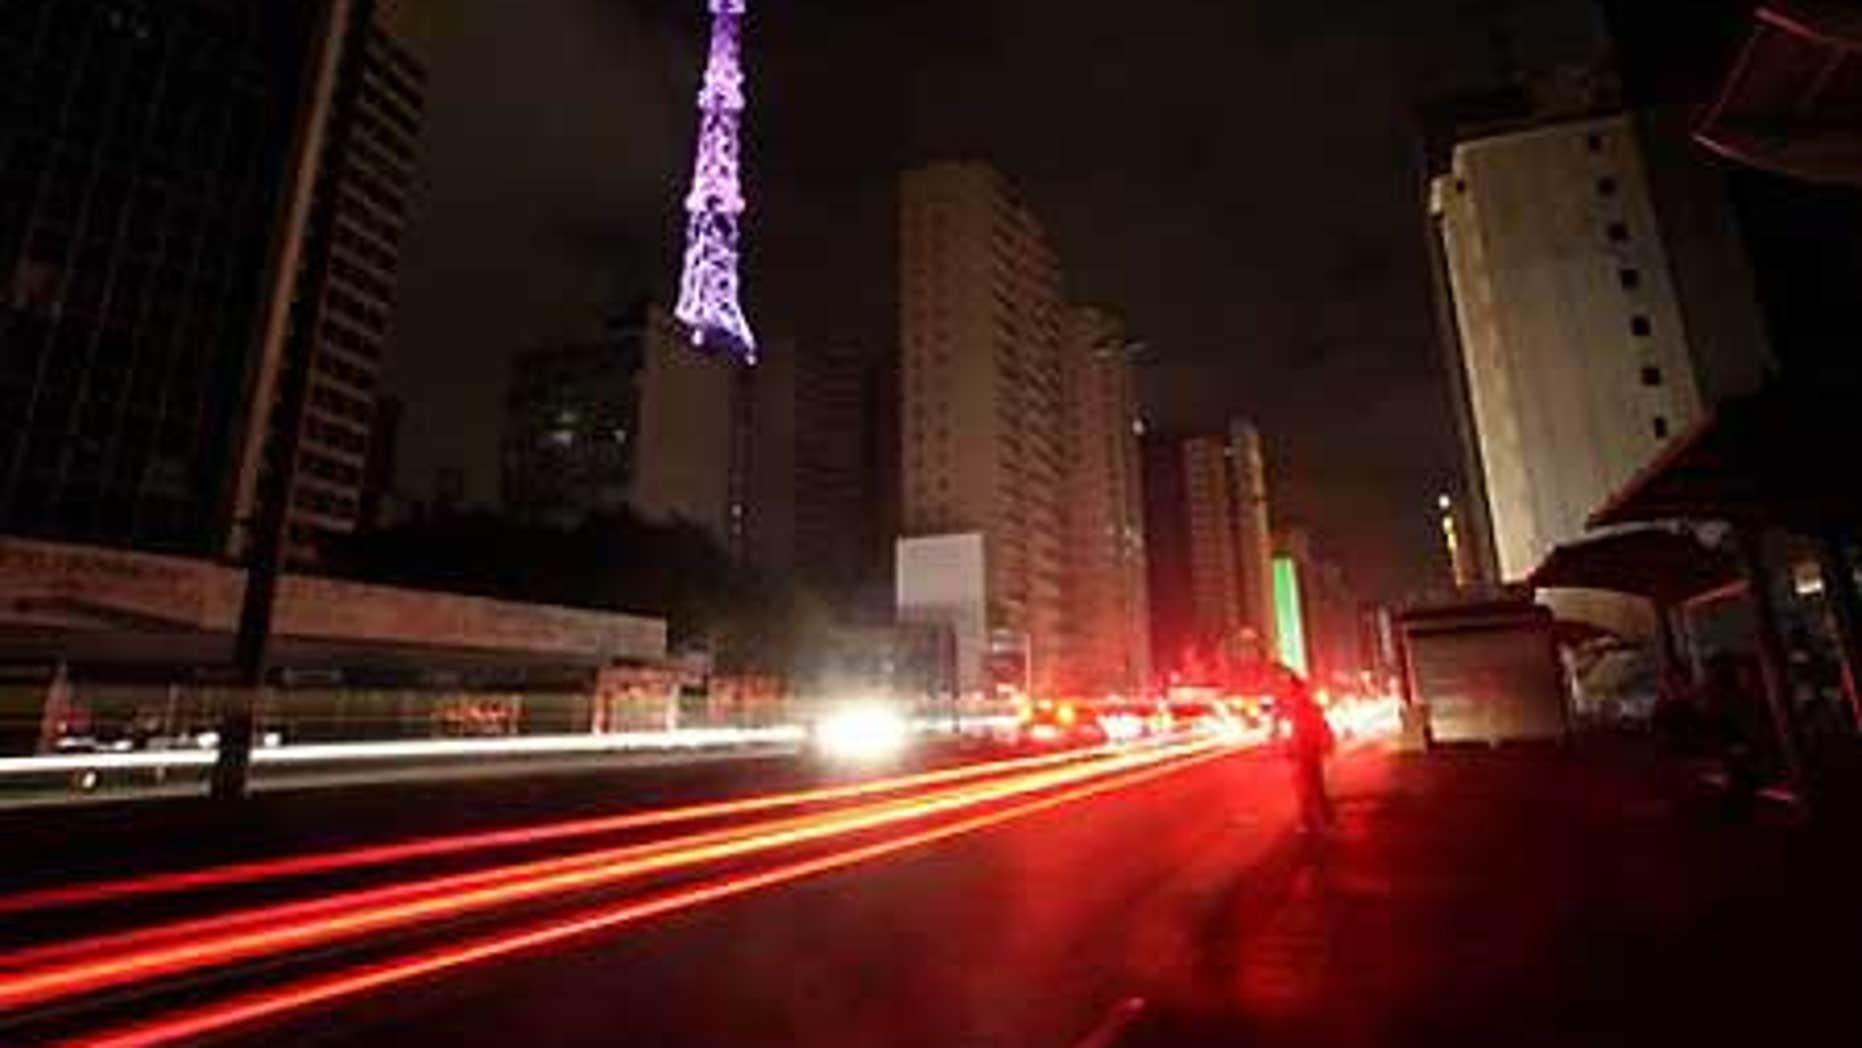 Nov. 10: Cars drive down Paulista Avenue in Sao Paulo, Brazil during a blackout.